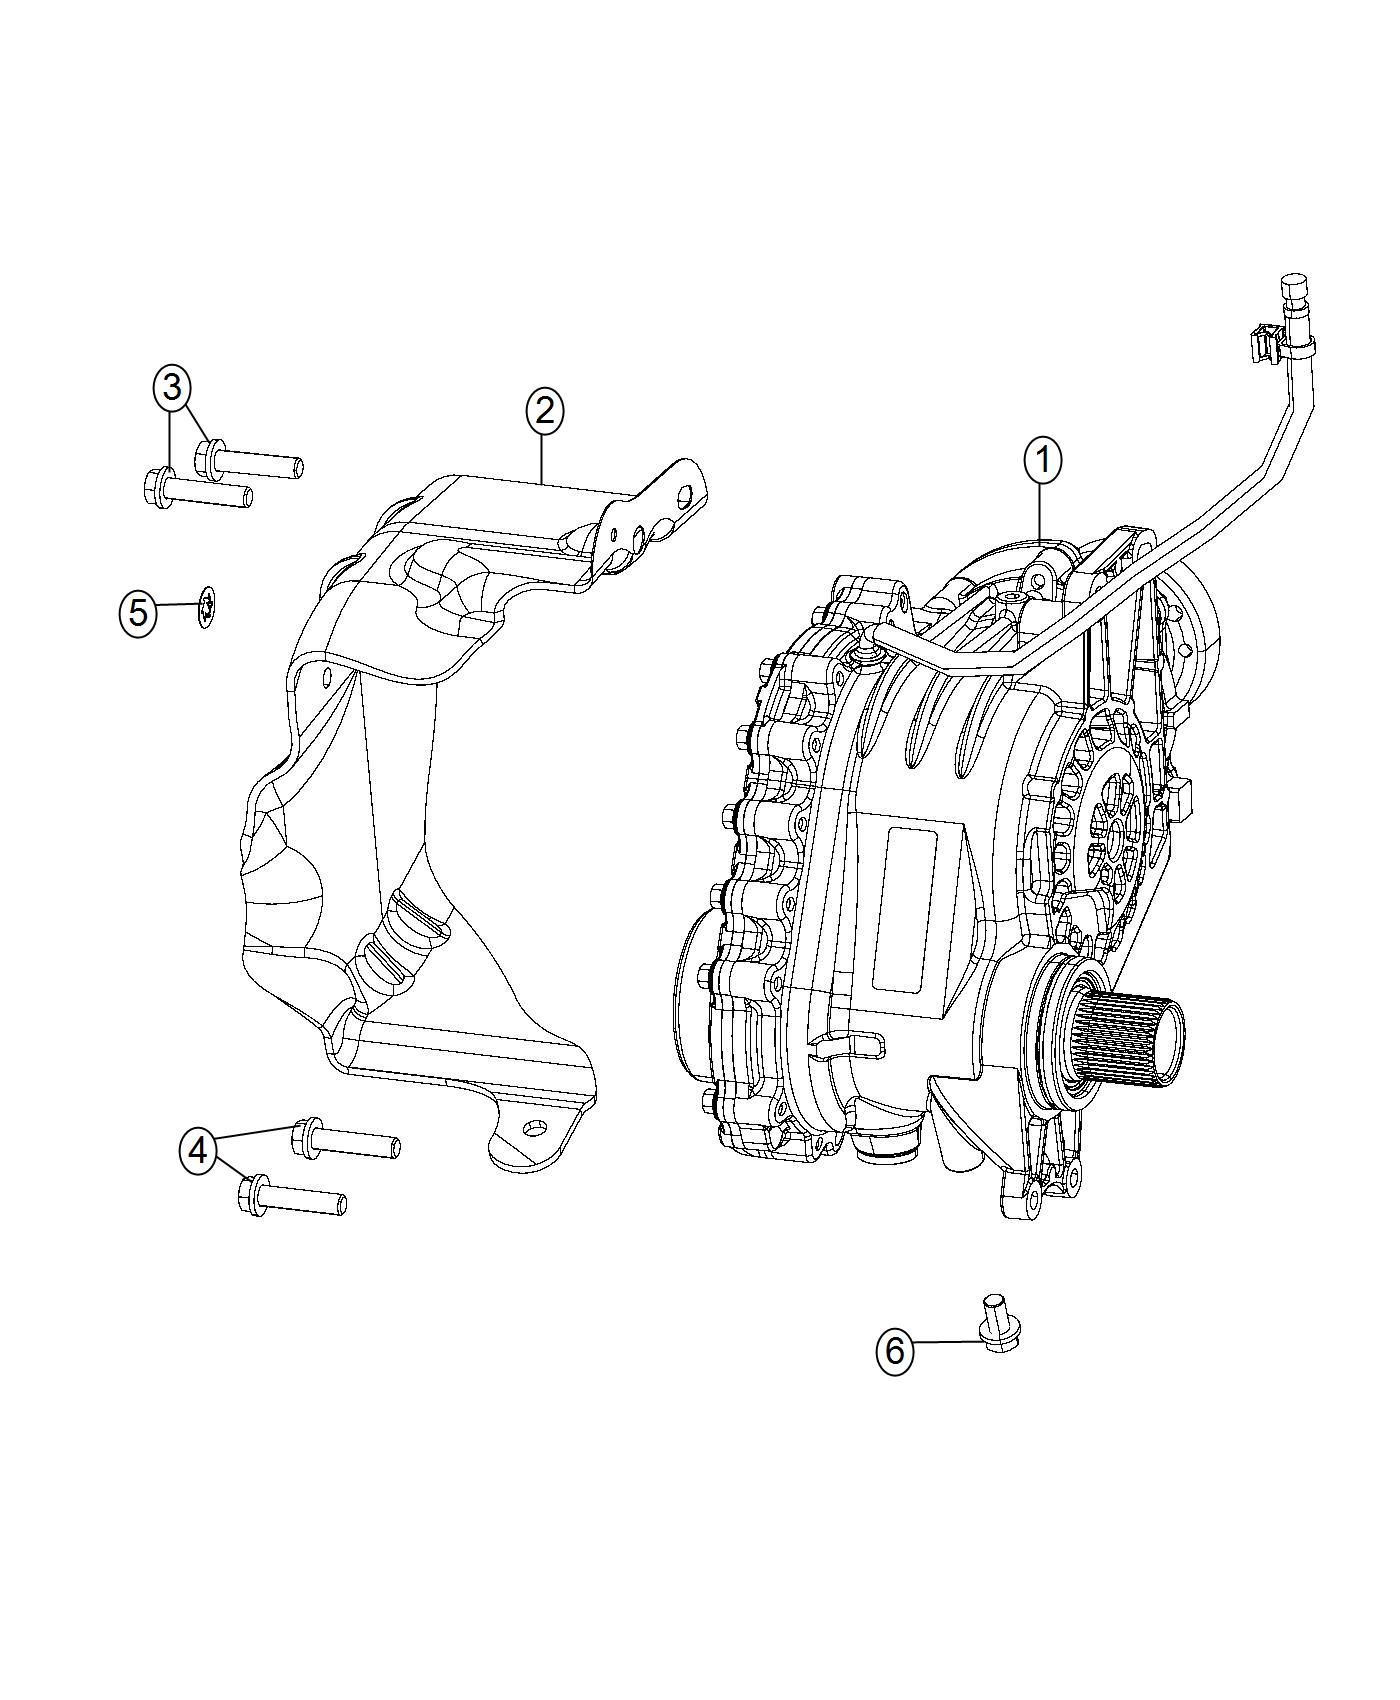 2014 Dodge Journey Shield. Heat. Power, unit, transfer